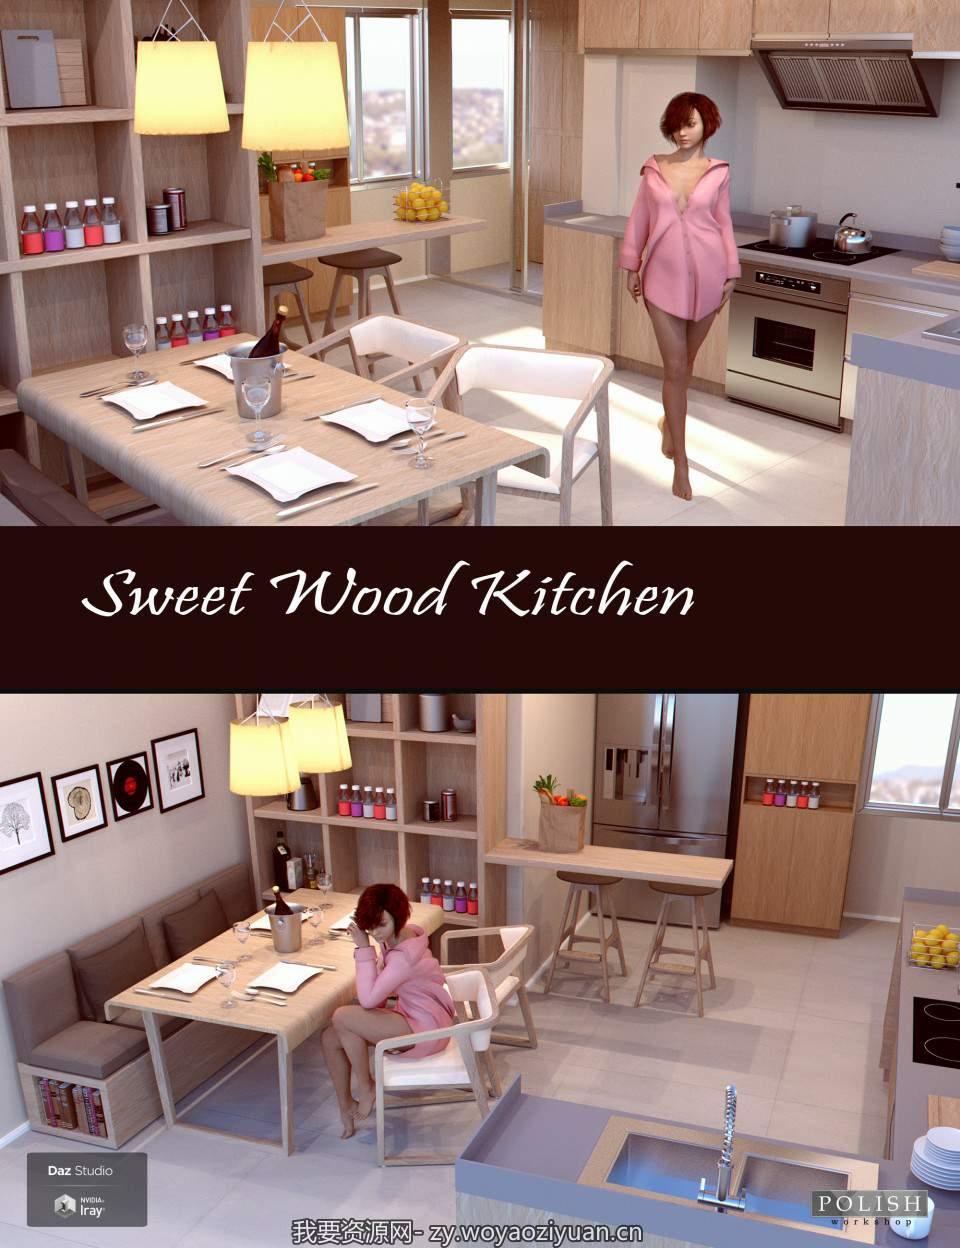 Sweet Wood Kitchen